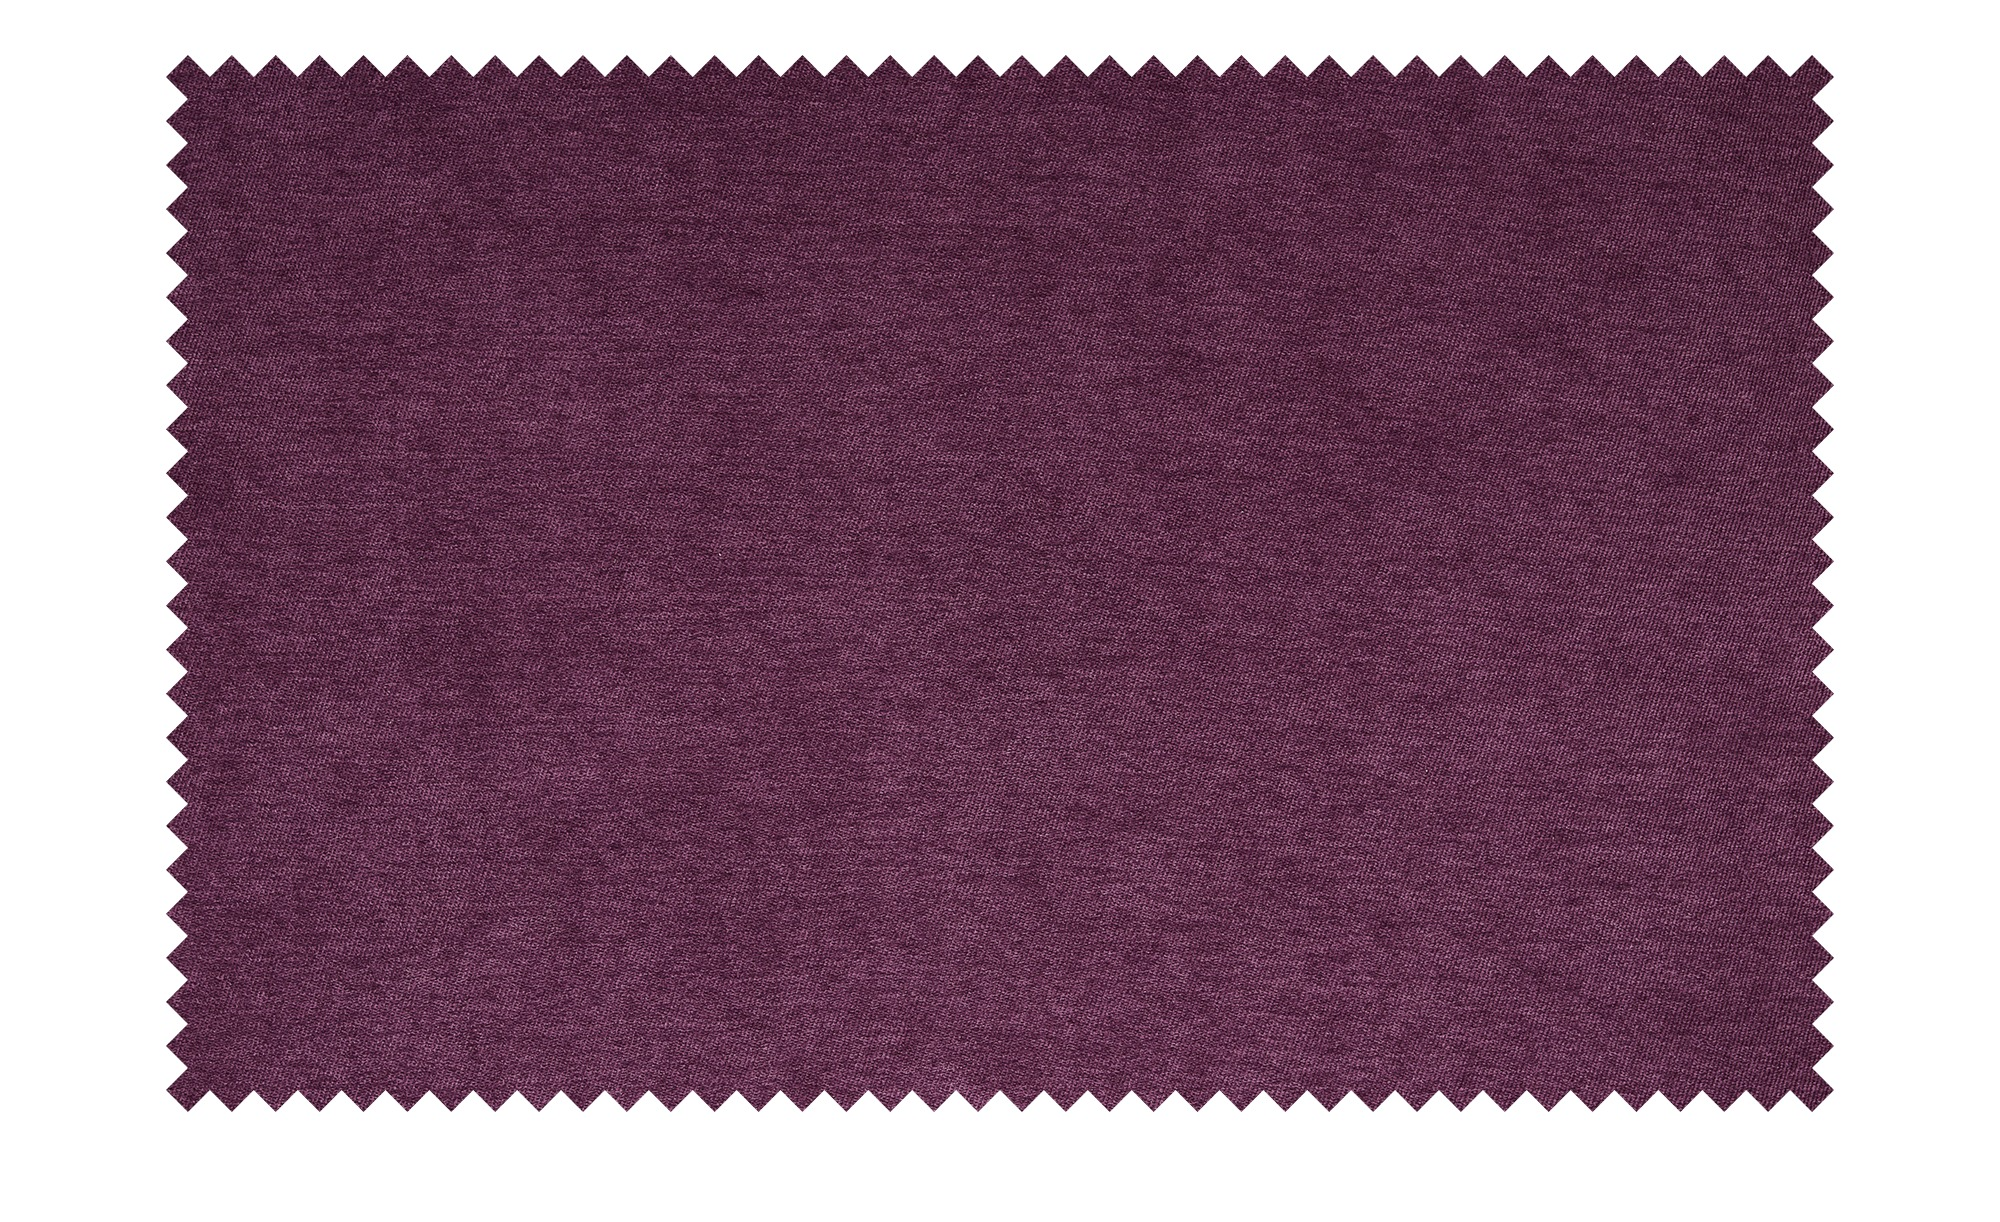 HOME STORY Bodenkissen  Pia ¦ lila/violett ¦ Füllung 100% Polyester ¦ Maße (cm): B: 60 Heimtextilien > Kissen > Bodenkissen - Höffner